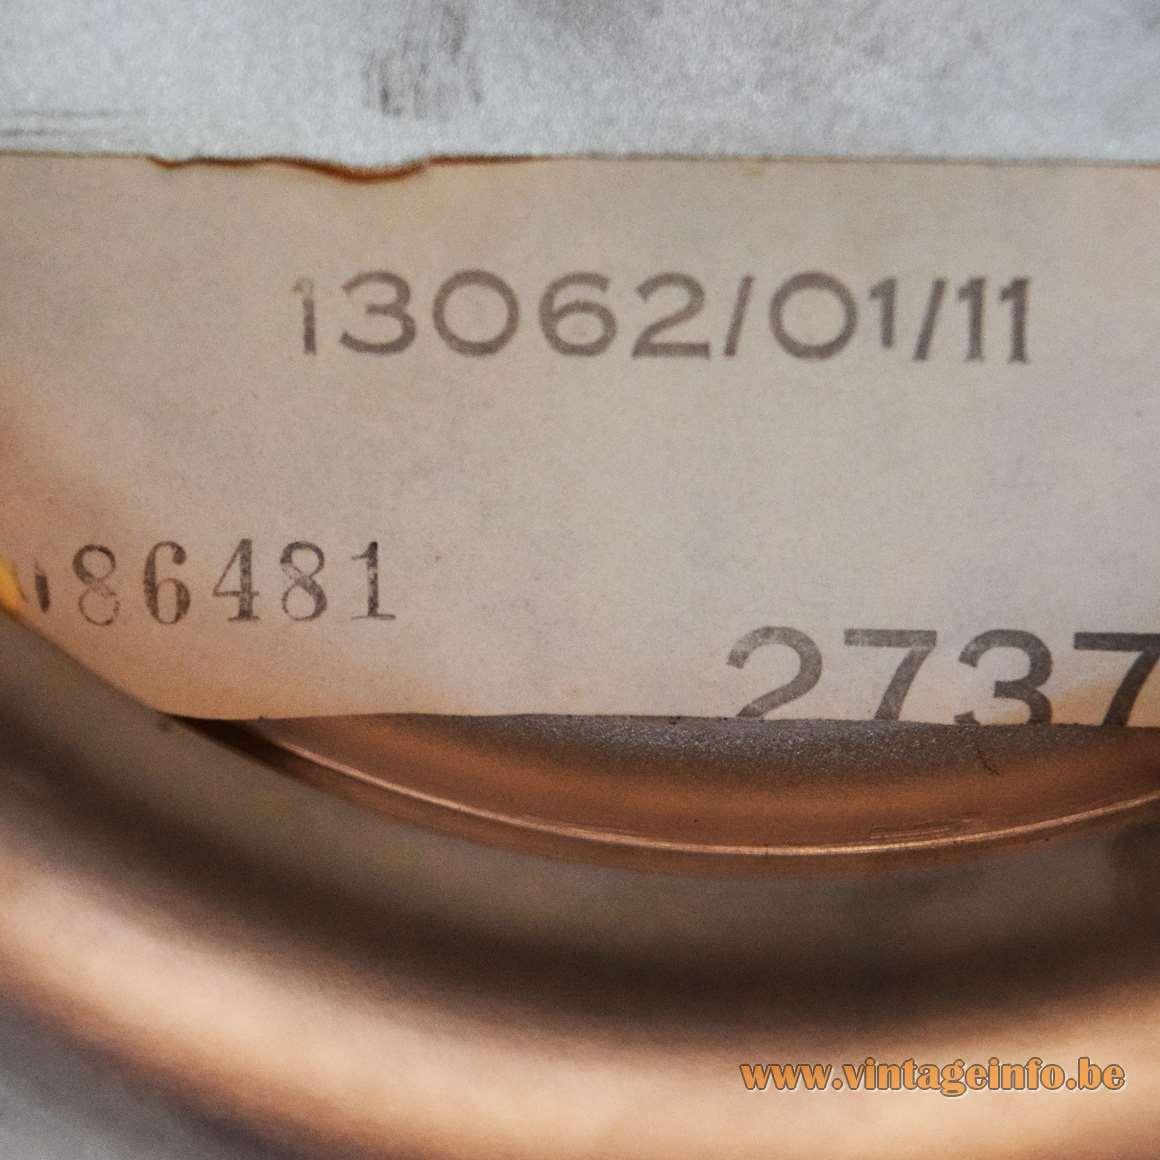 1970s Massive Table Lamp - Label